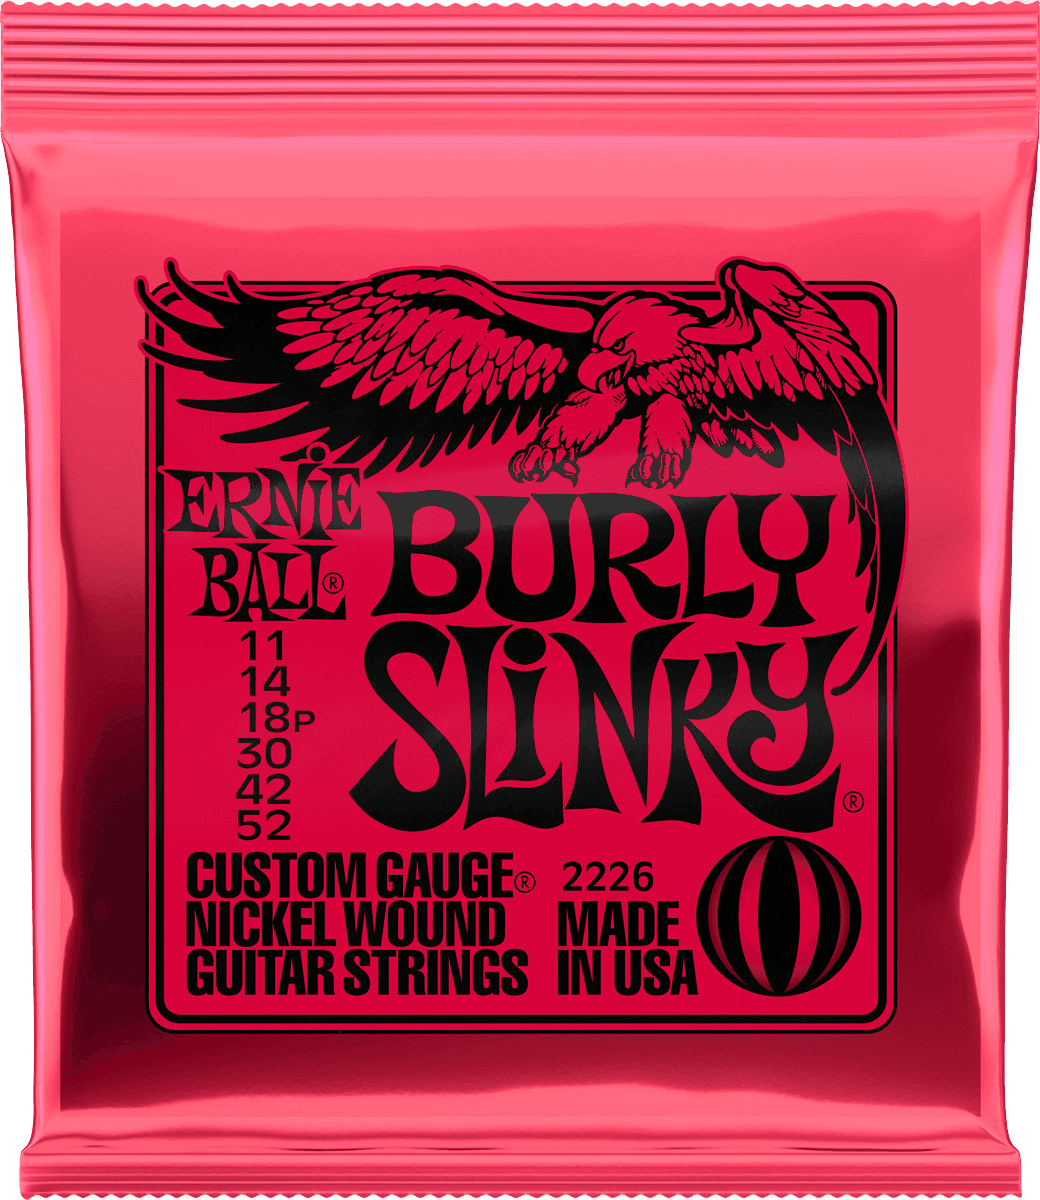 Ernie Ball Burly slinky 11-52